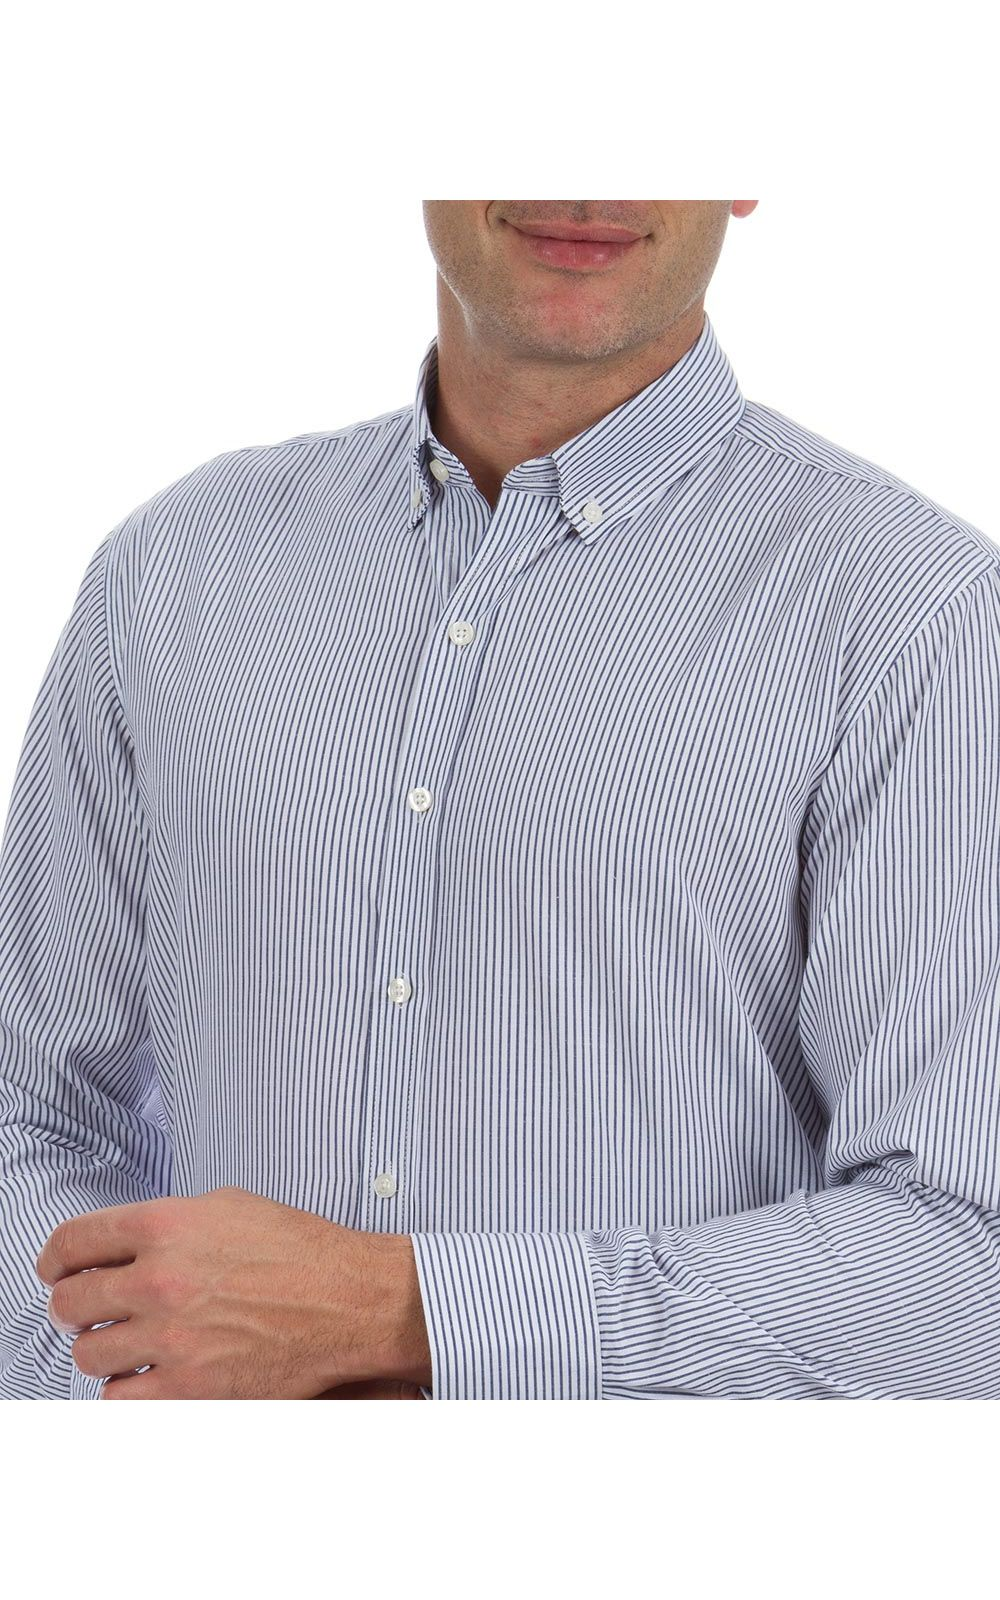 Foto 7 - Camisa Social Masculina Azul Listrada